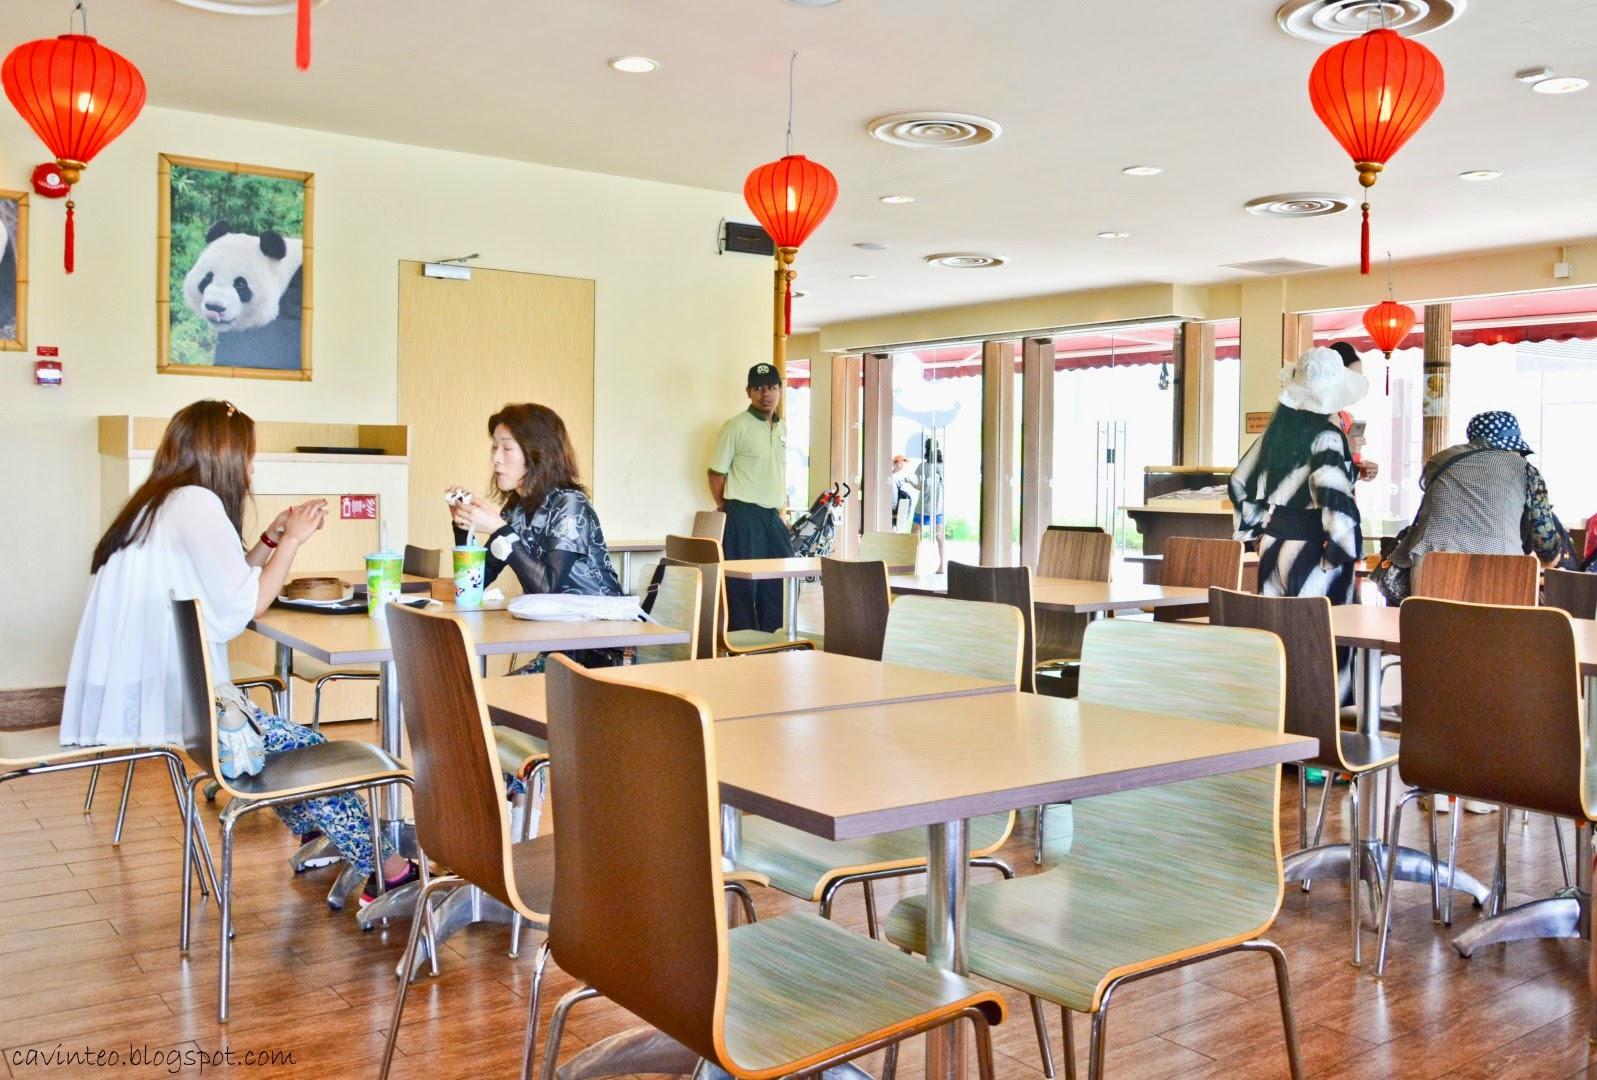 Mama Panda Kitchen (熊猫妈妈小吃)   The Expensive Panda Themed Fast Food  Restaurant @ River Safari [Singapore]